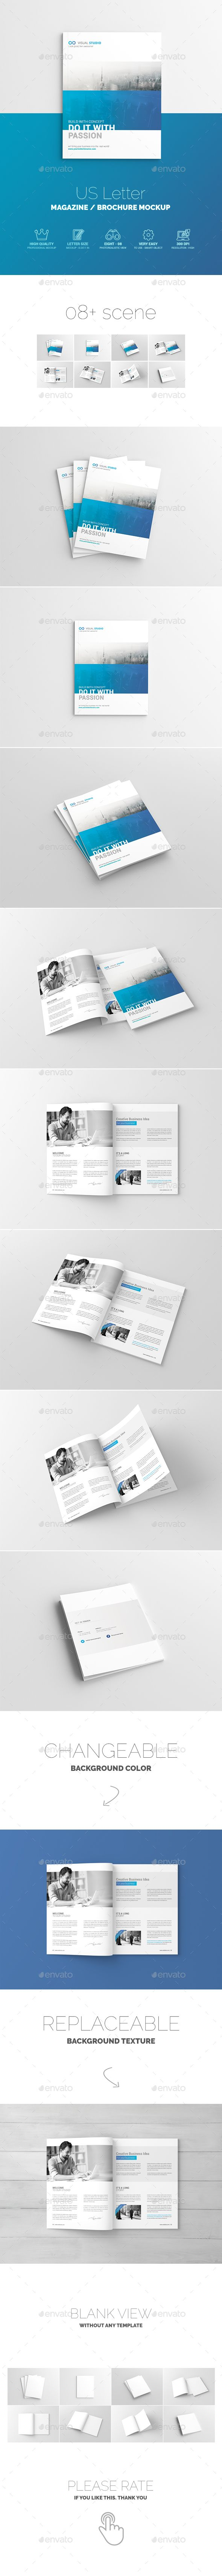 US Letter Magazine / Brochure Mock-Up. Download here: http://graphicriver.net/item/us-letter-magazine-brochure-mockup/14706960?ref=ksioks